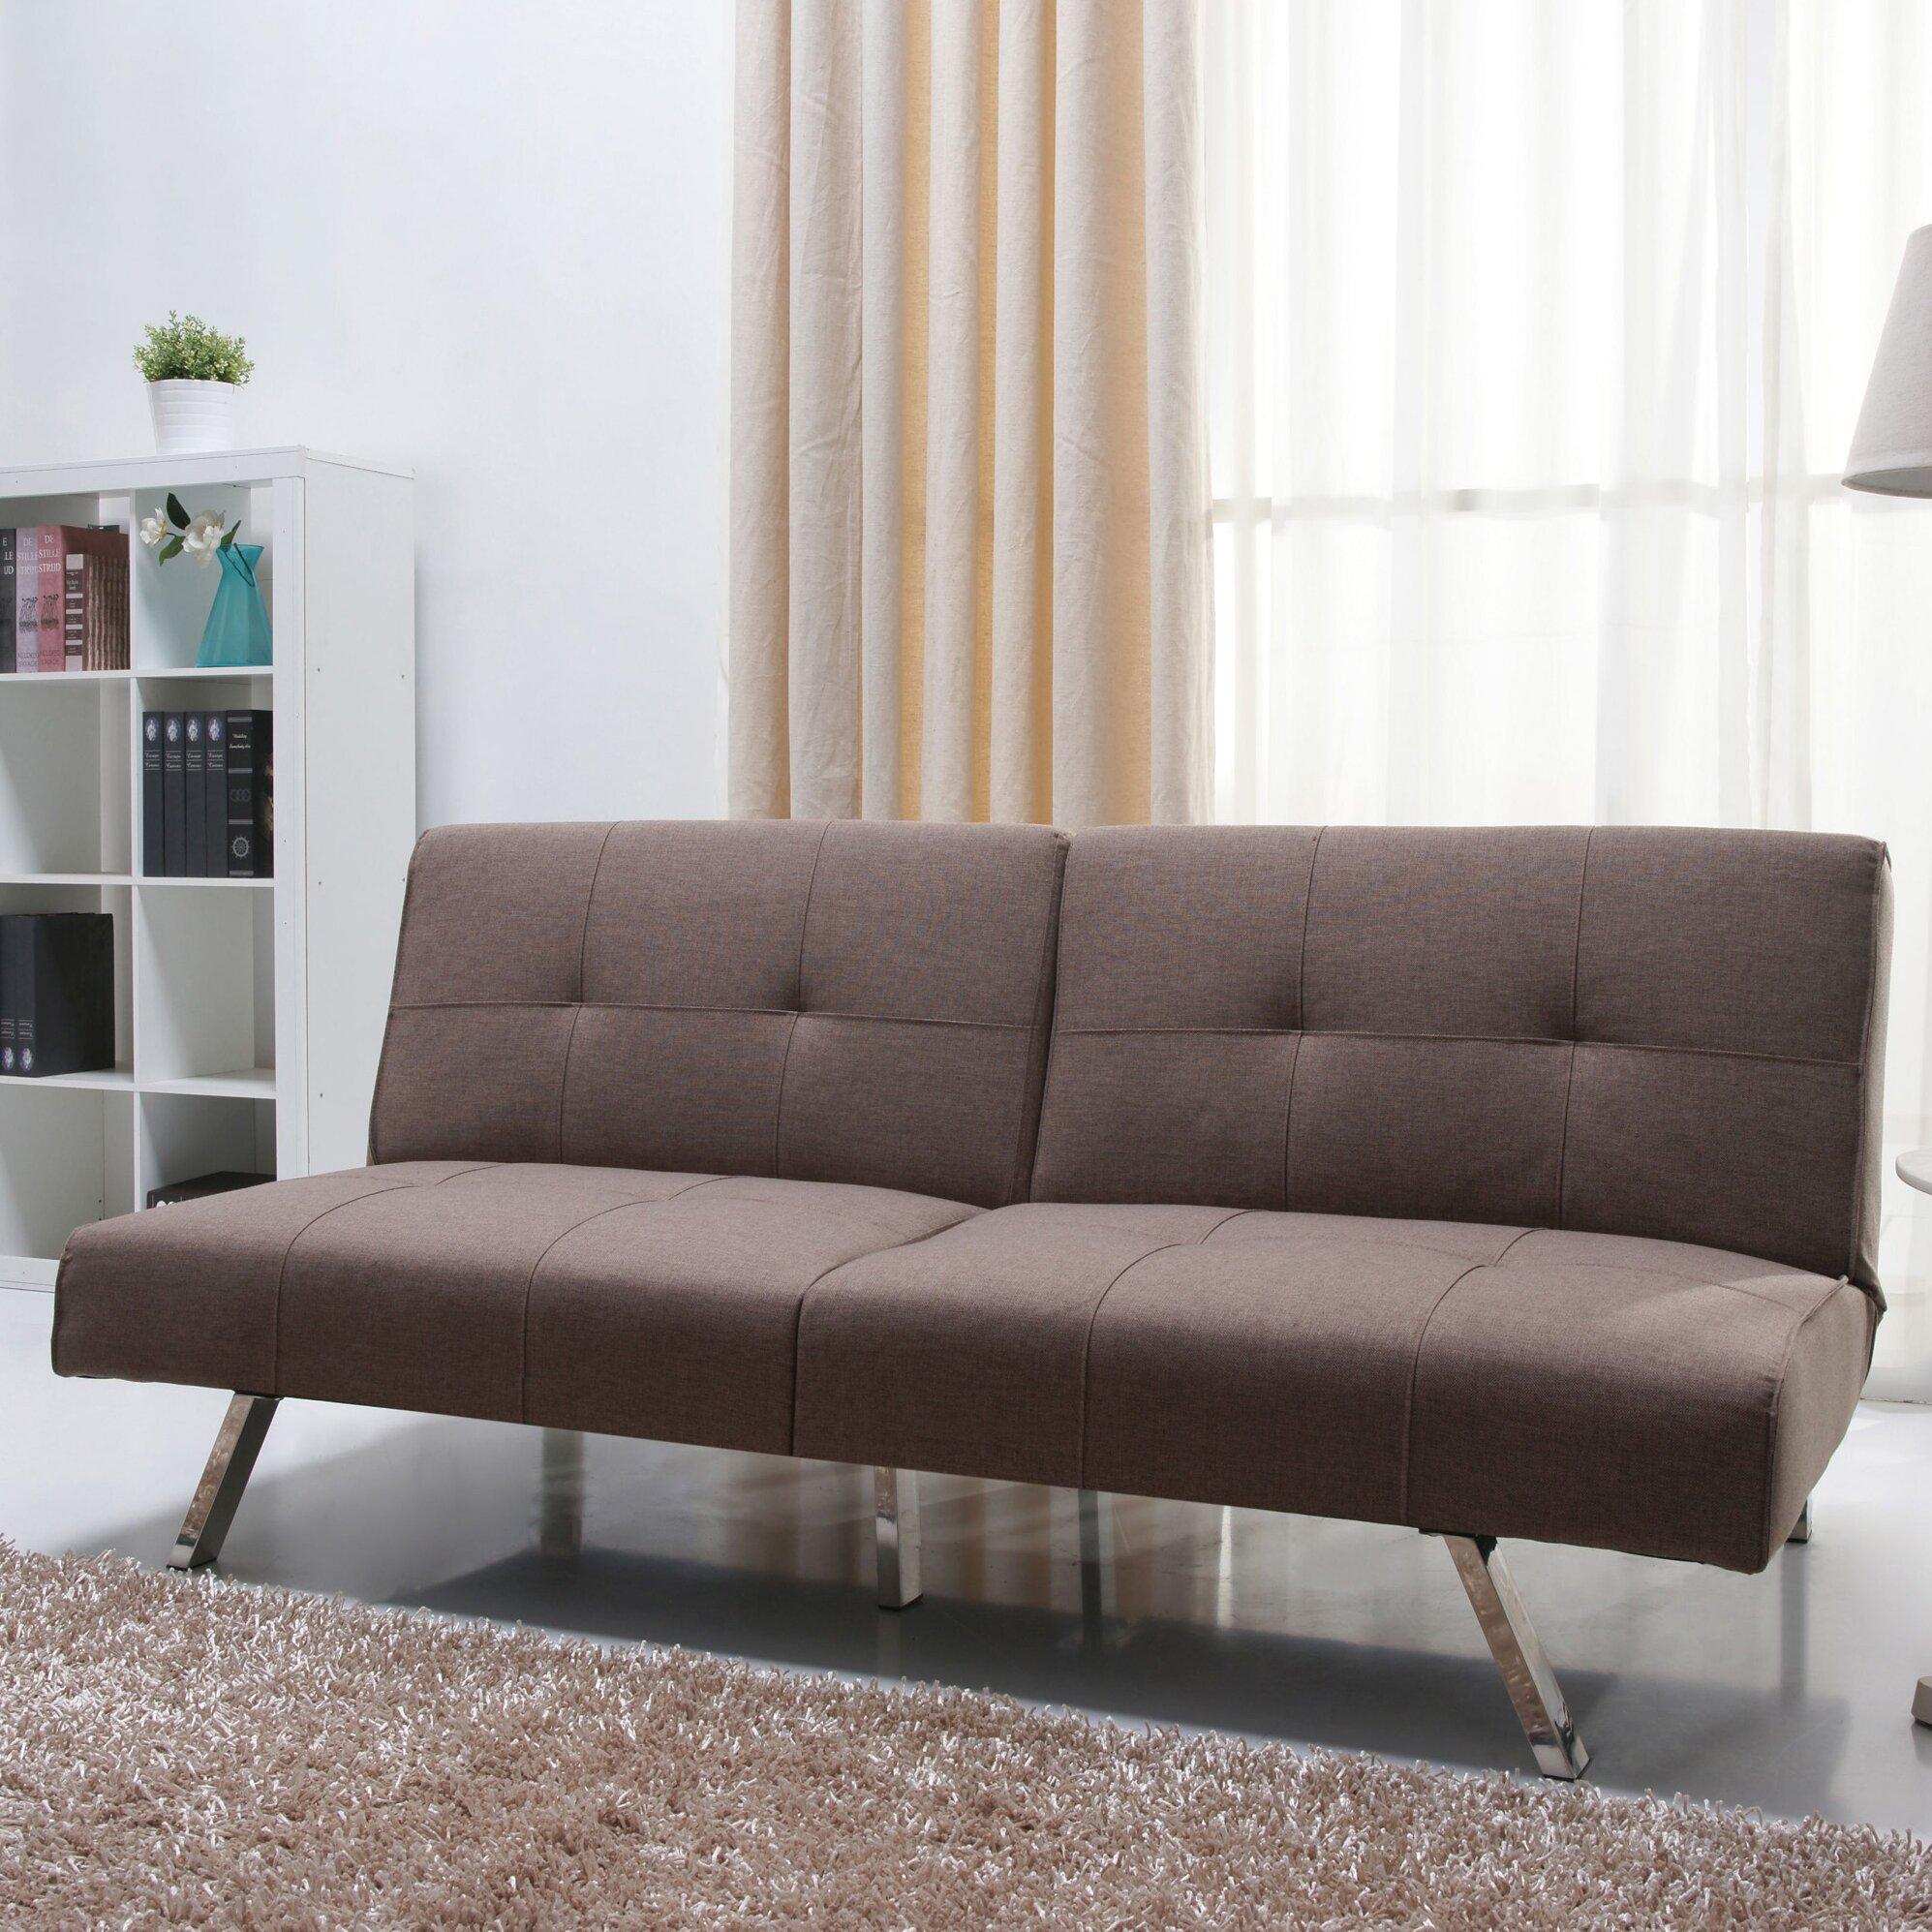 Varick Gallery Rosehill Foldable Futon Sofa Bed Amp Reviews